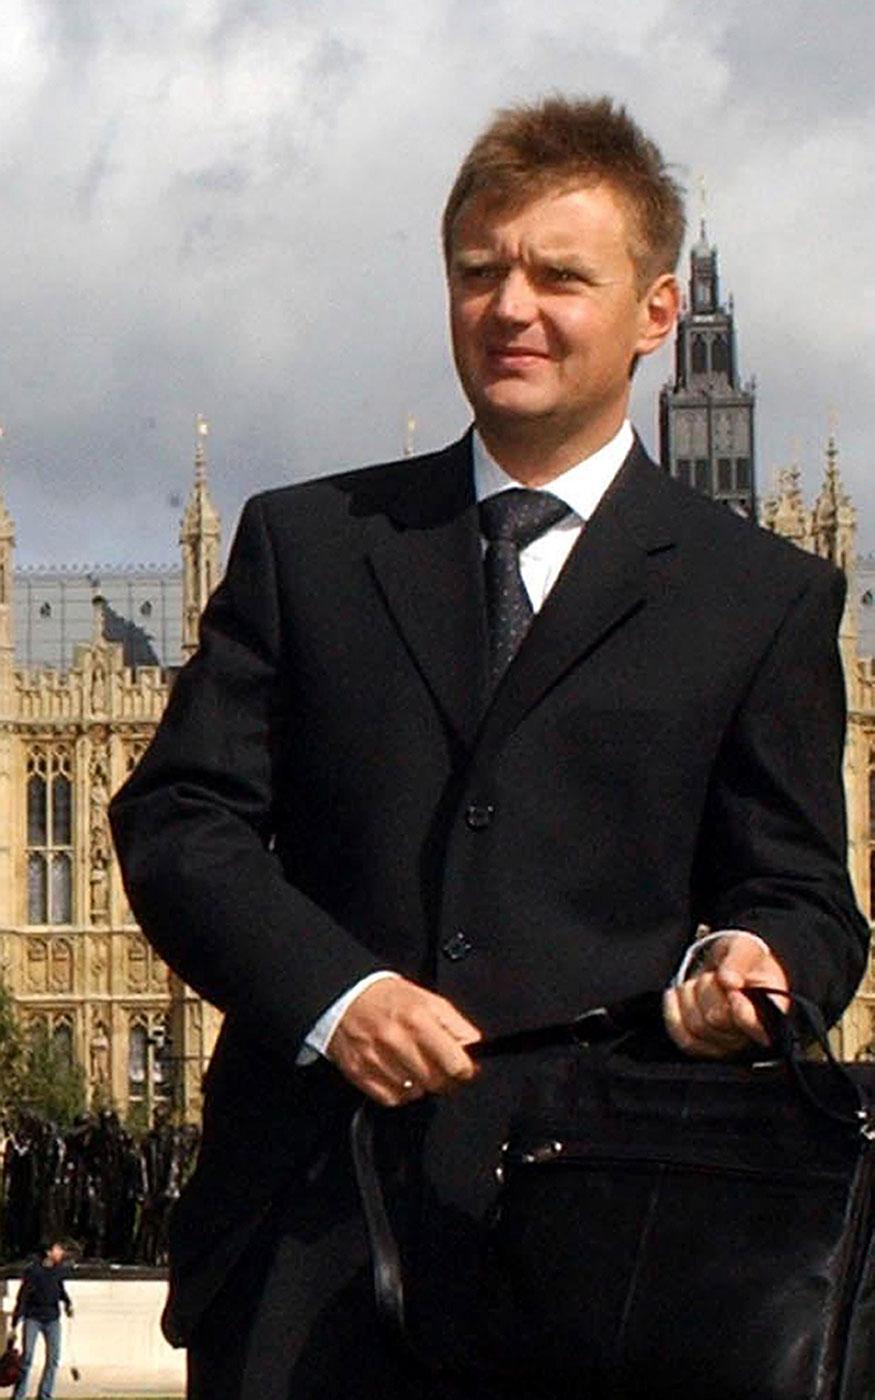 Former Russian intelligence officer Alexander Litvinenko is seen on Sept. 14, 2004.